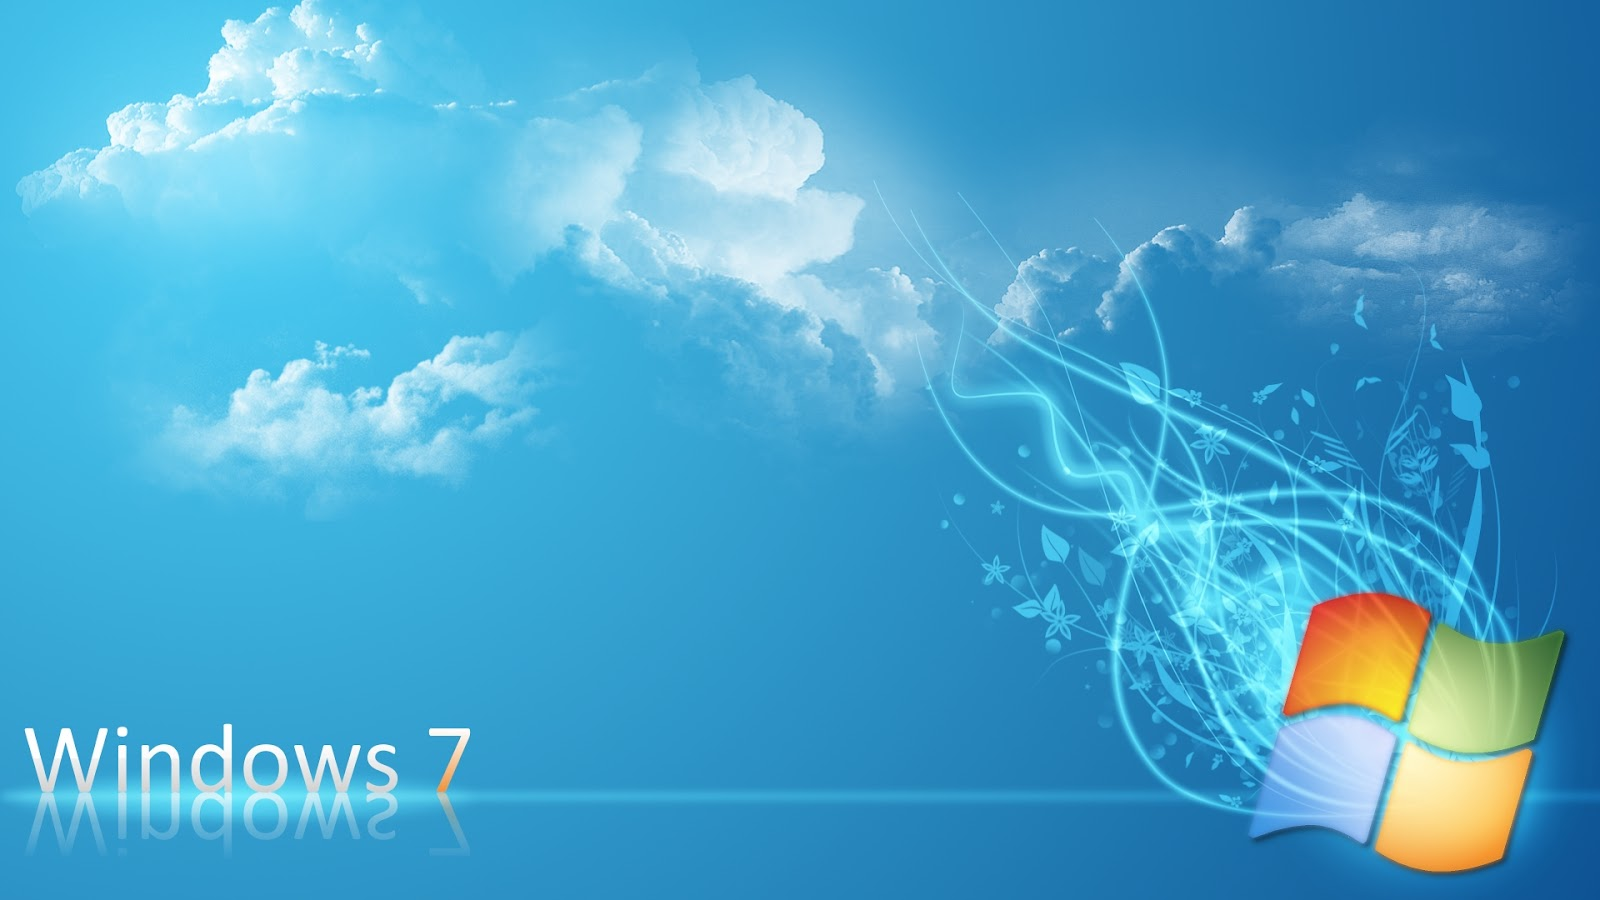 http://1.bp.blogspot.com/-6R9JRVuXAoI/T4KuXVZlhdI/AAAAAAAAEQI/Fx9mb_UuTZQ/s1600/windowshdwallpaperbyanimusdesign.jpg